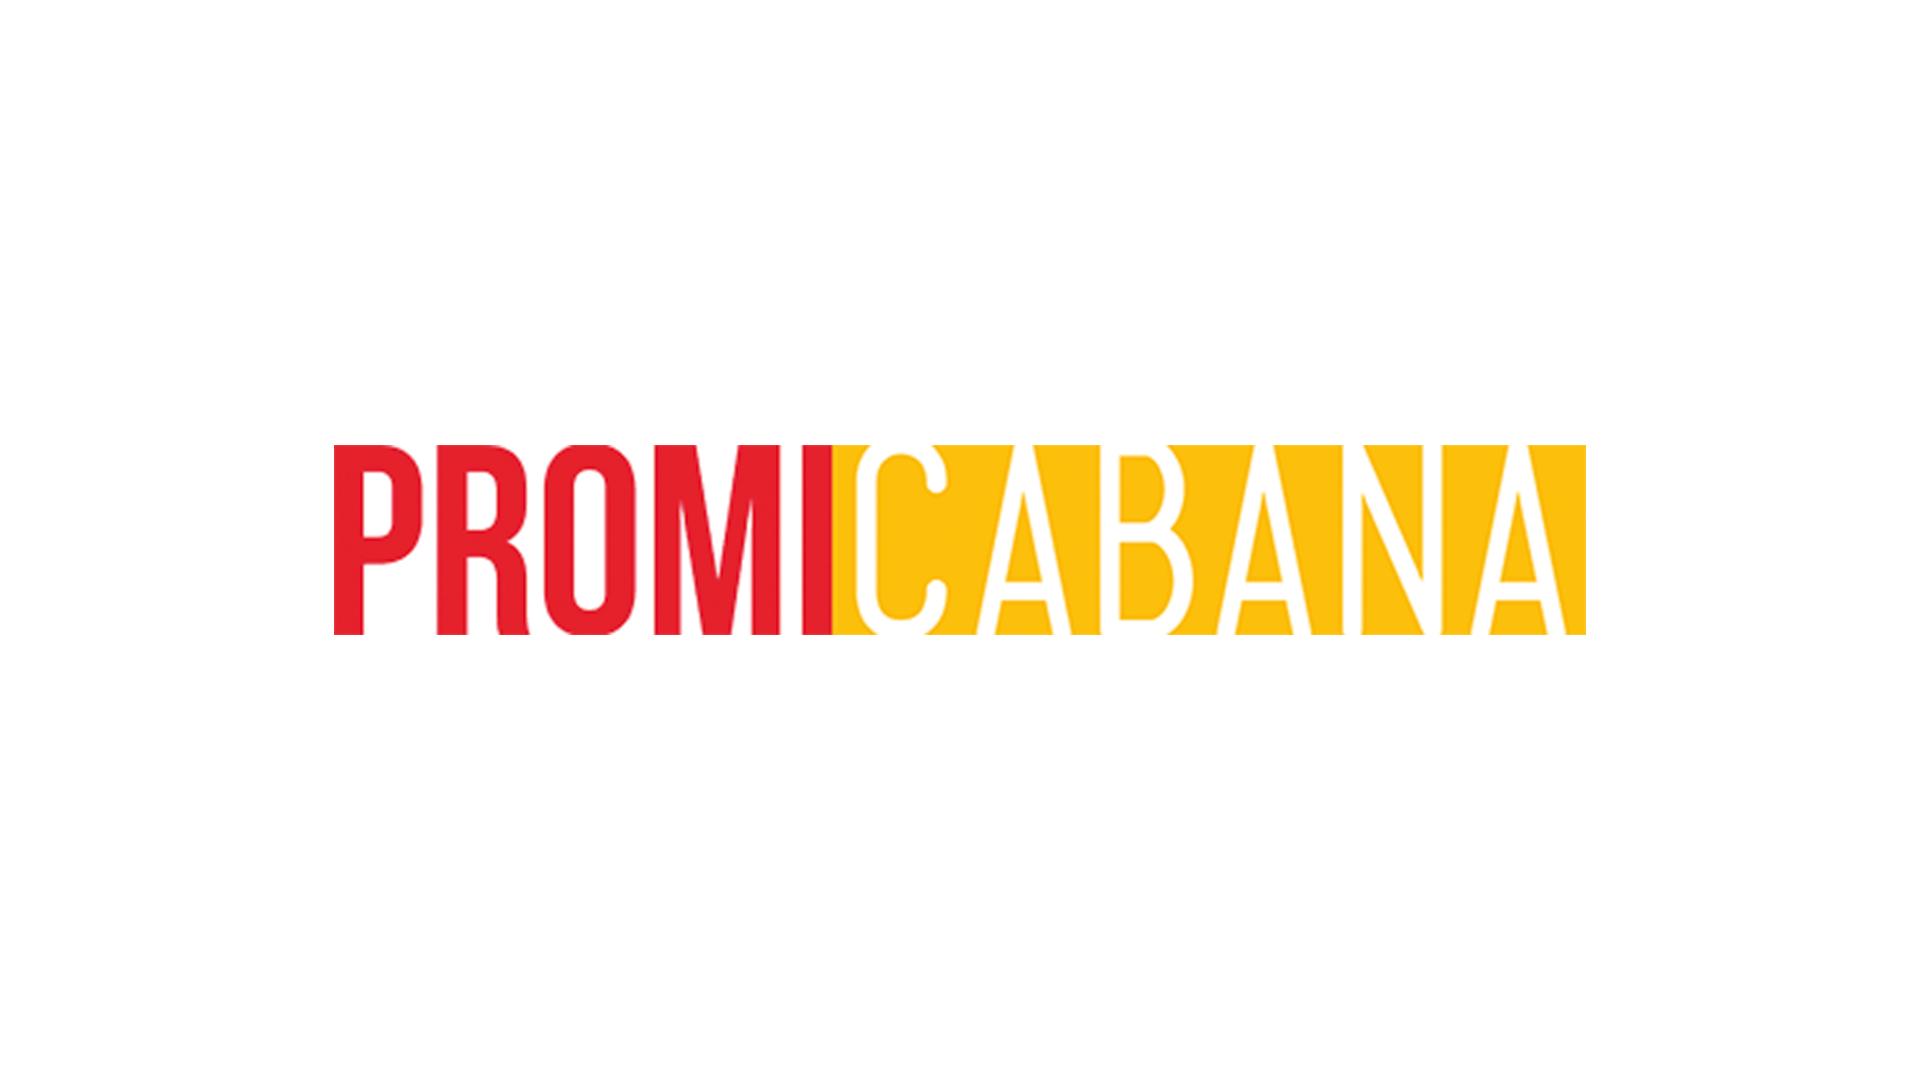 Miley-Cyrus-Selena-Gomez-Instagram-Montage